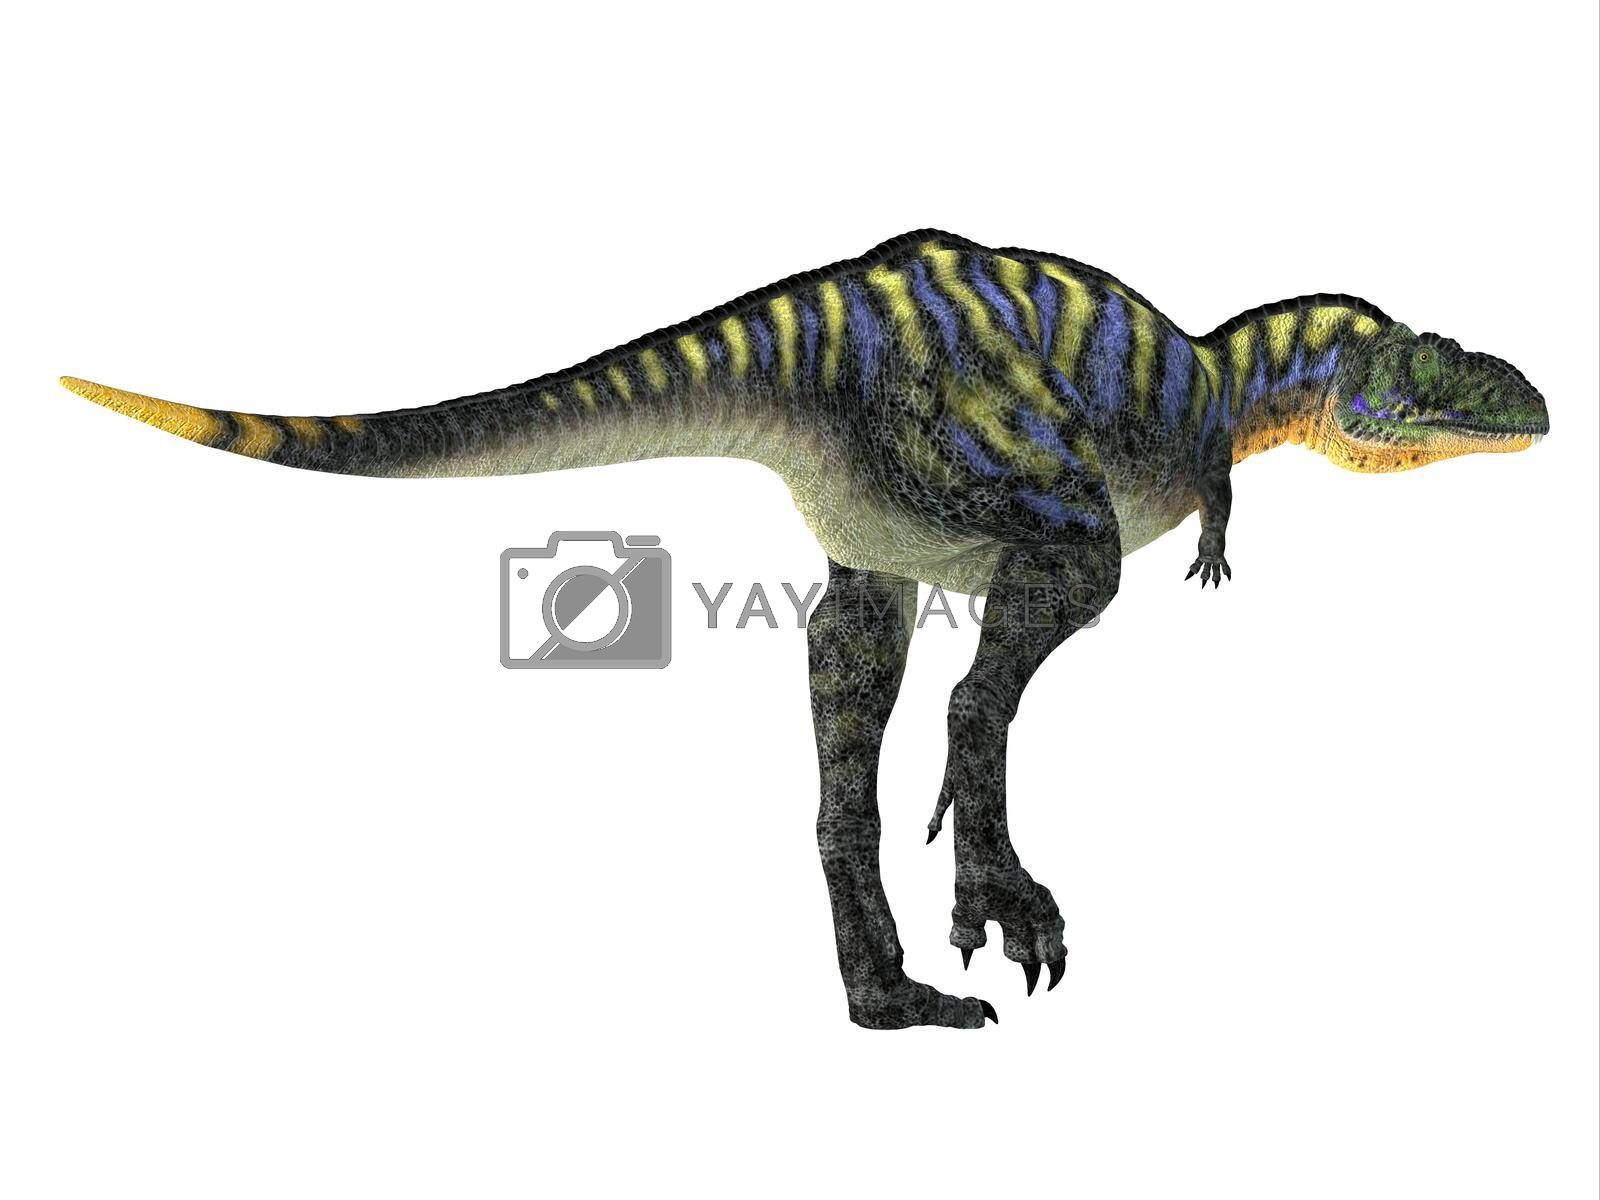 Royalty free image of Aucasaurus Dinosaur Tail by Catmando